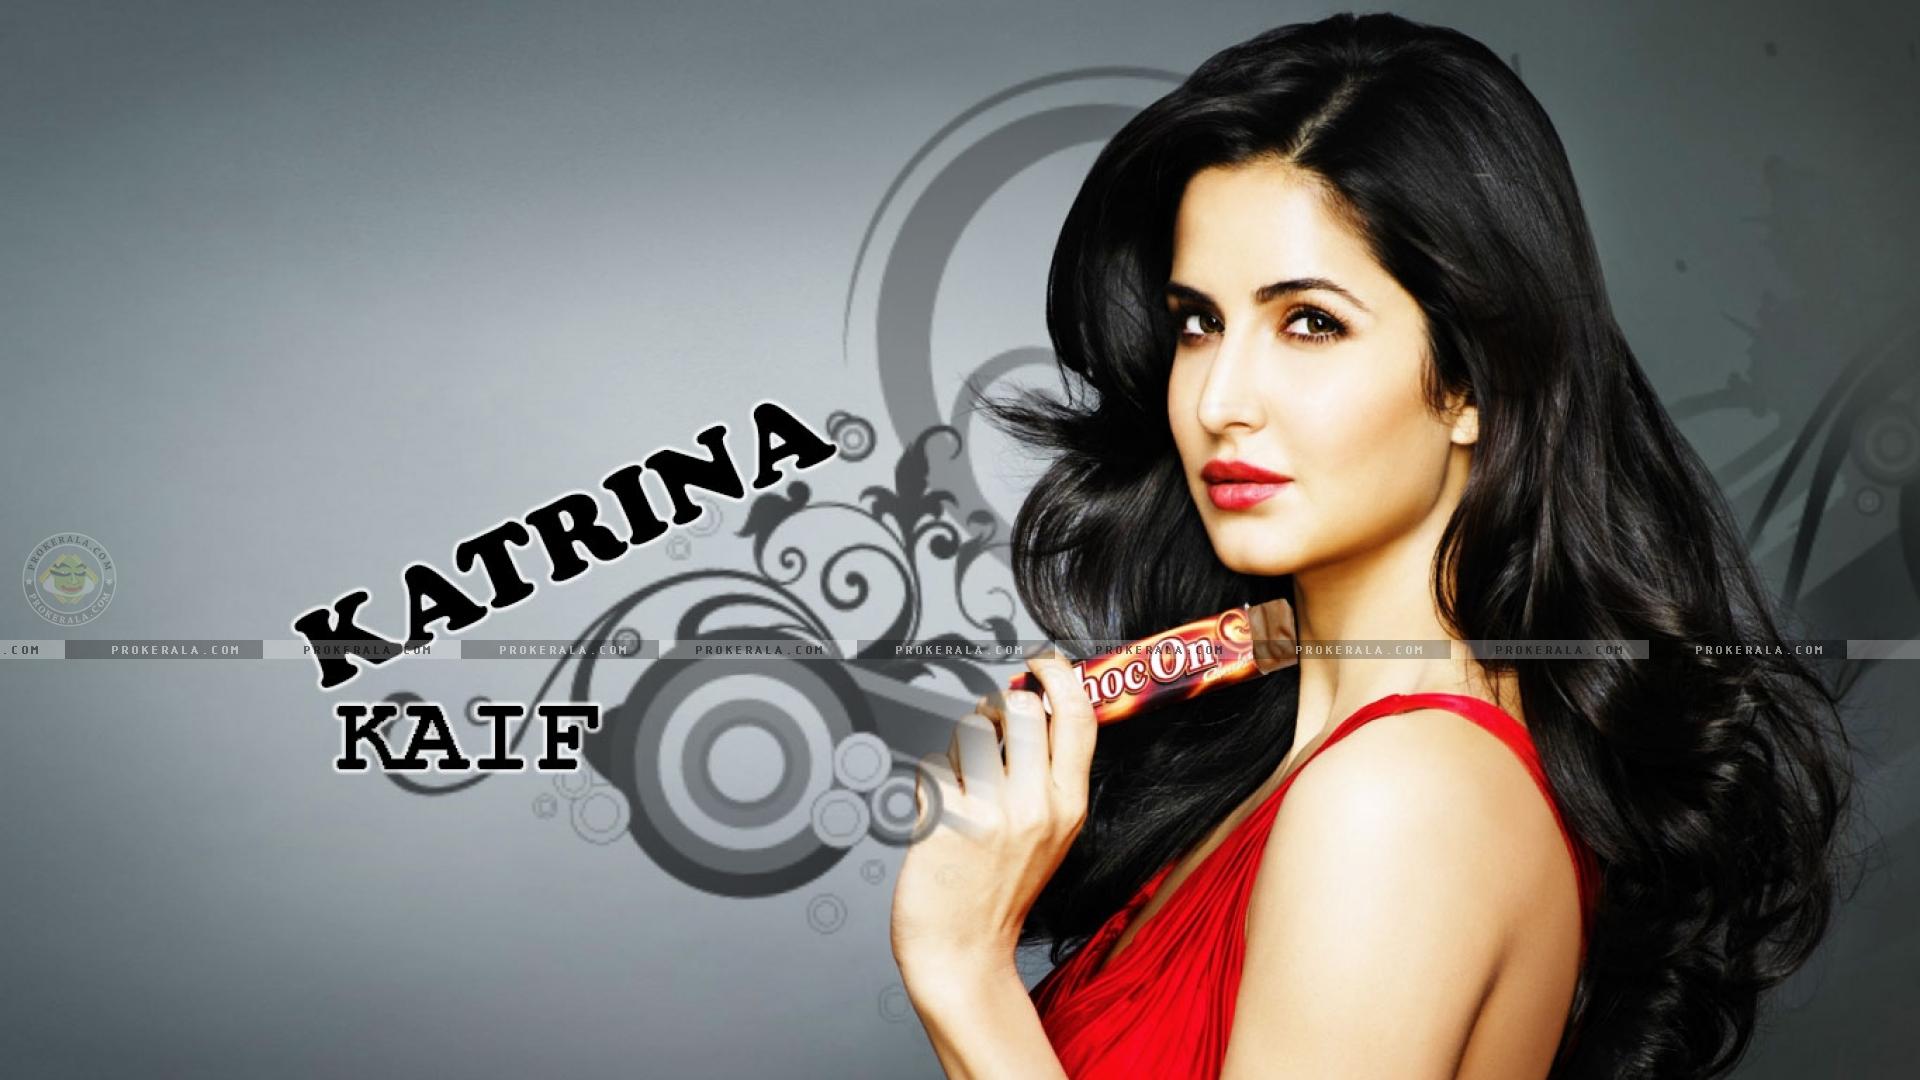 Download katrina kaif desktop wallpaer - Download Katrina Kaif Desktop Wallpaer 6